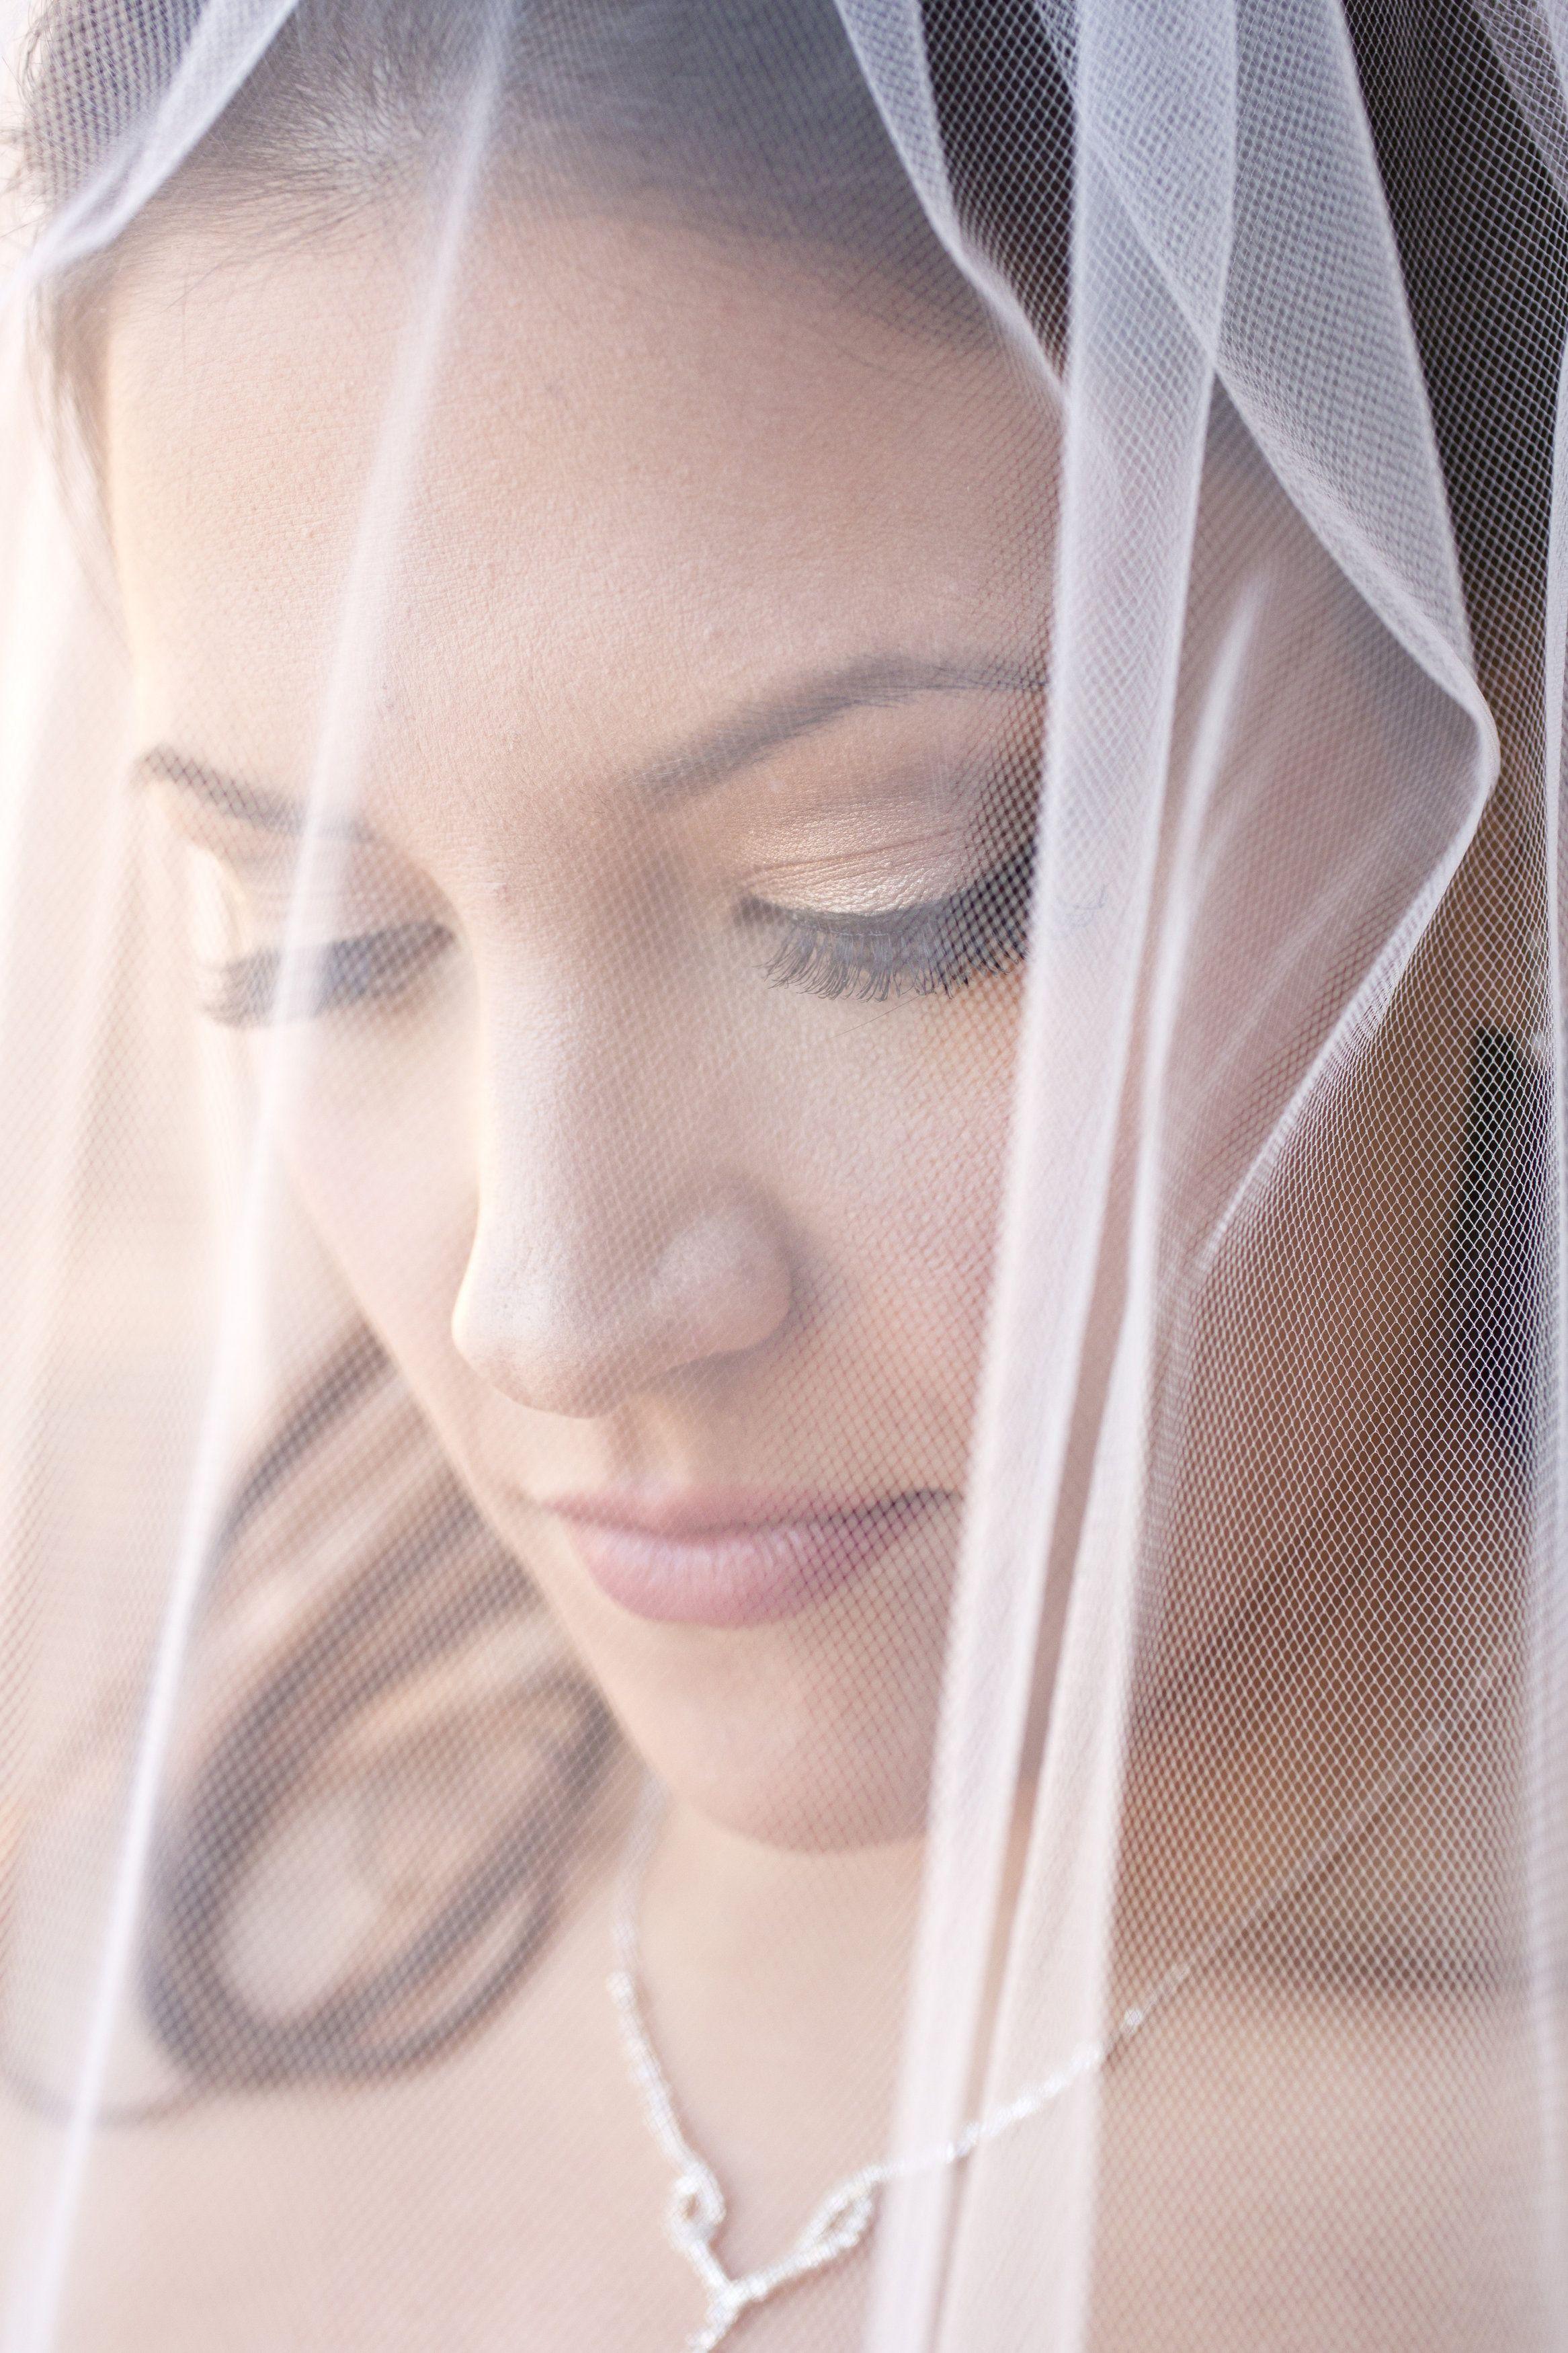 bridal makeup | northern arizona glam squad | www.nazglamsquad